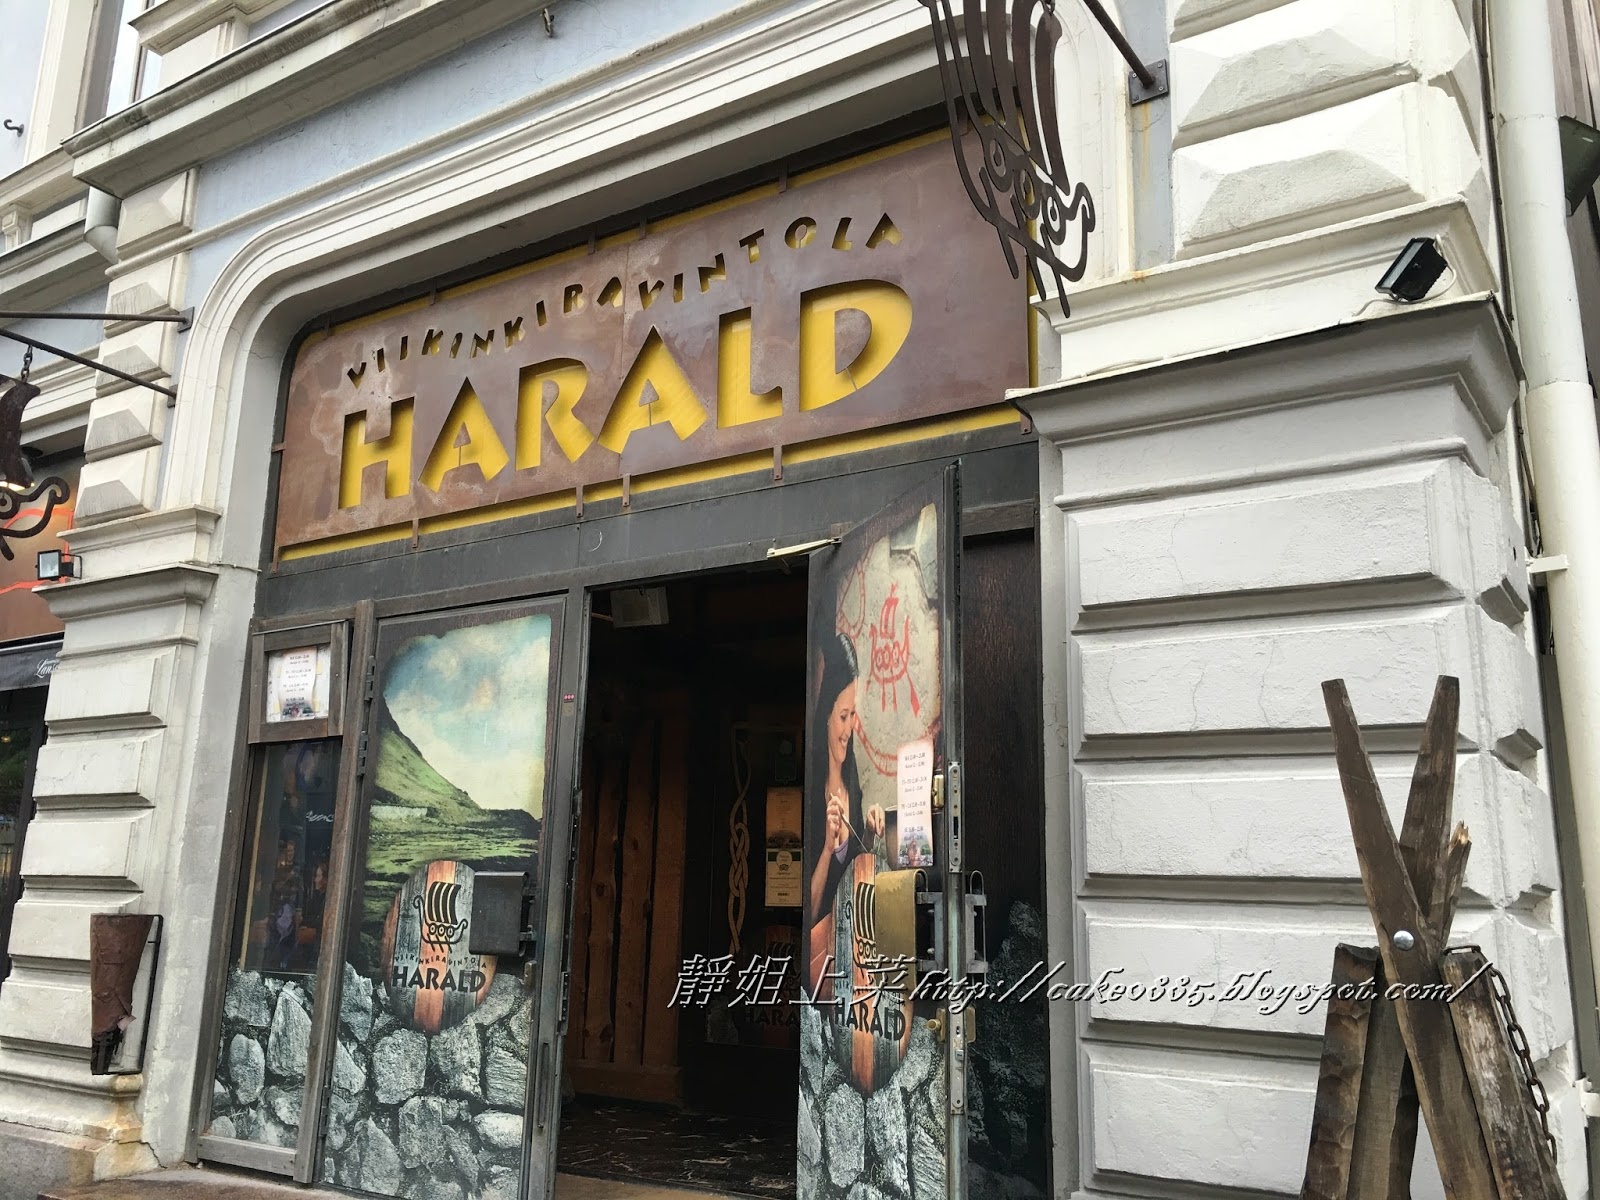 Viking Outdoor Kitchen Aid Classic Mixer 靜姐上菜 Jean的廚房飲食歡樂記 芬蘭塔爾庫 Turku Finland 之食旅 維京人起源於斯堪那維亞半島 瑞典 挪威 丹麥等那一塊北歐區域 有時也包括芬蘭和更北的冰島 是以海盜起家 幅員遼闊且勢力範圍龐大 善於航海和掠奪 廢話不然怎麼